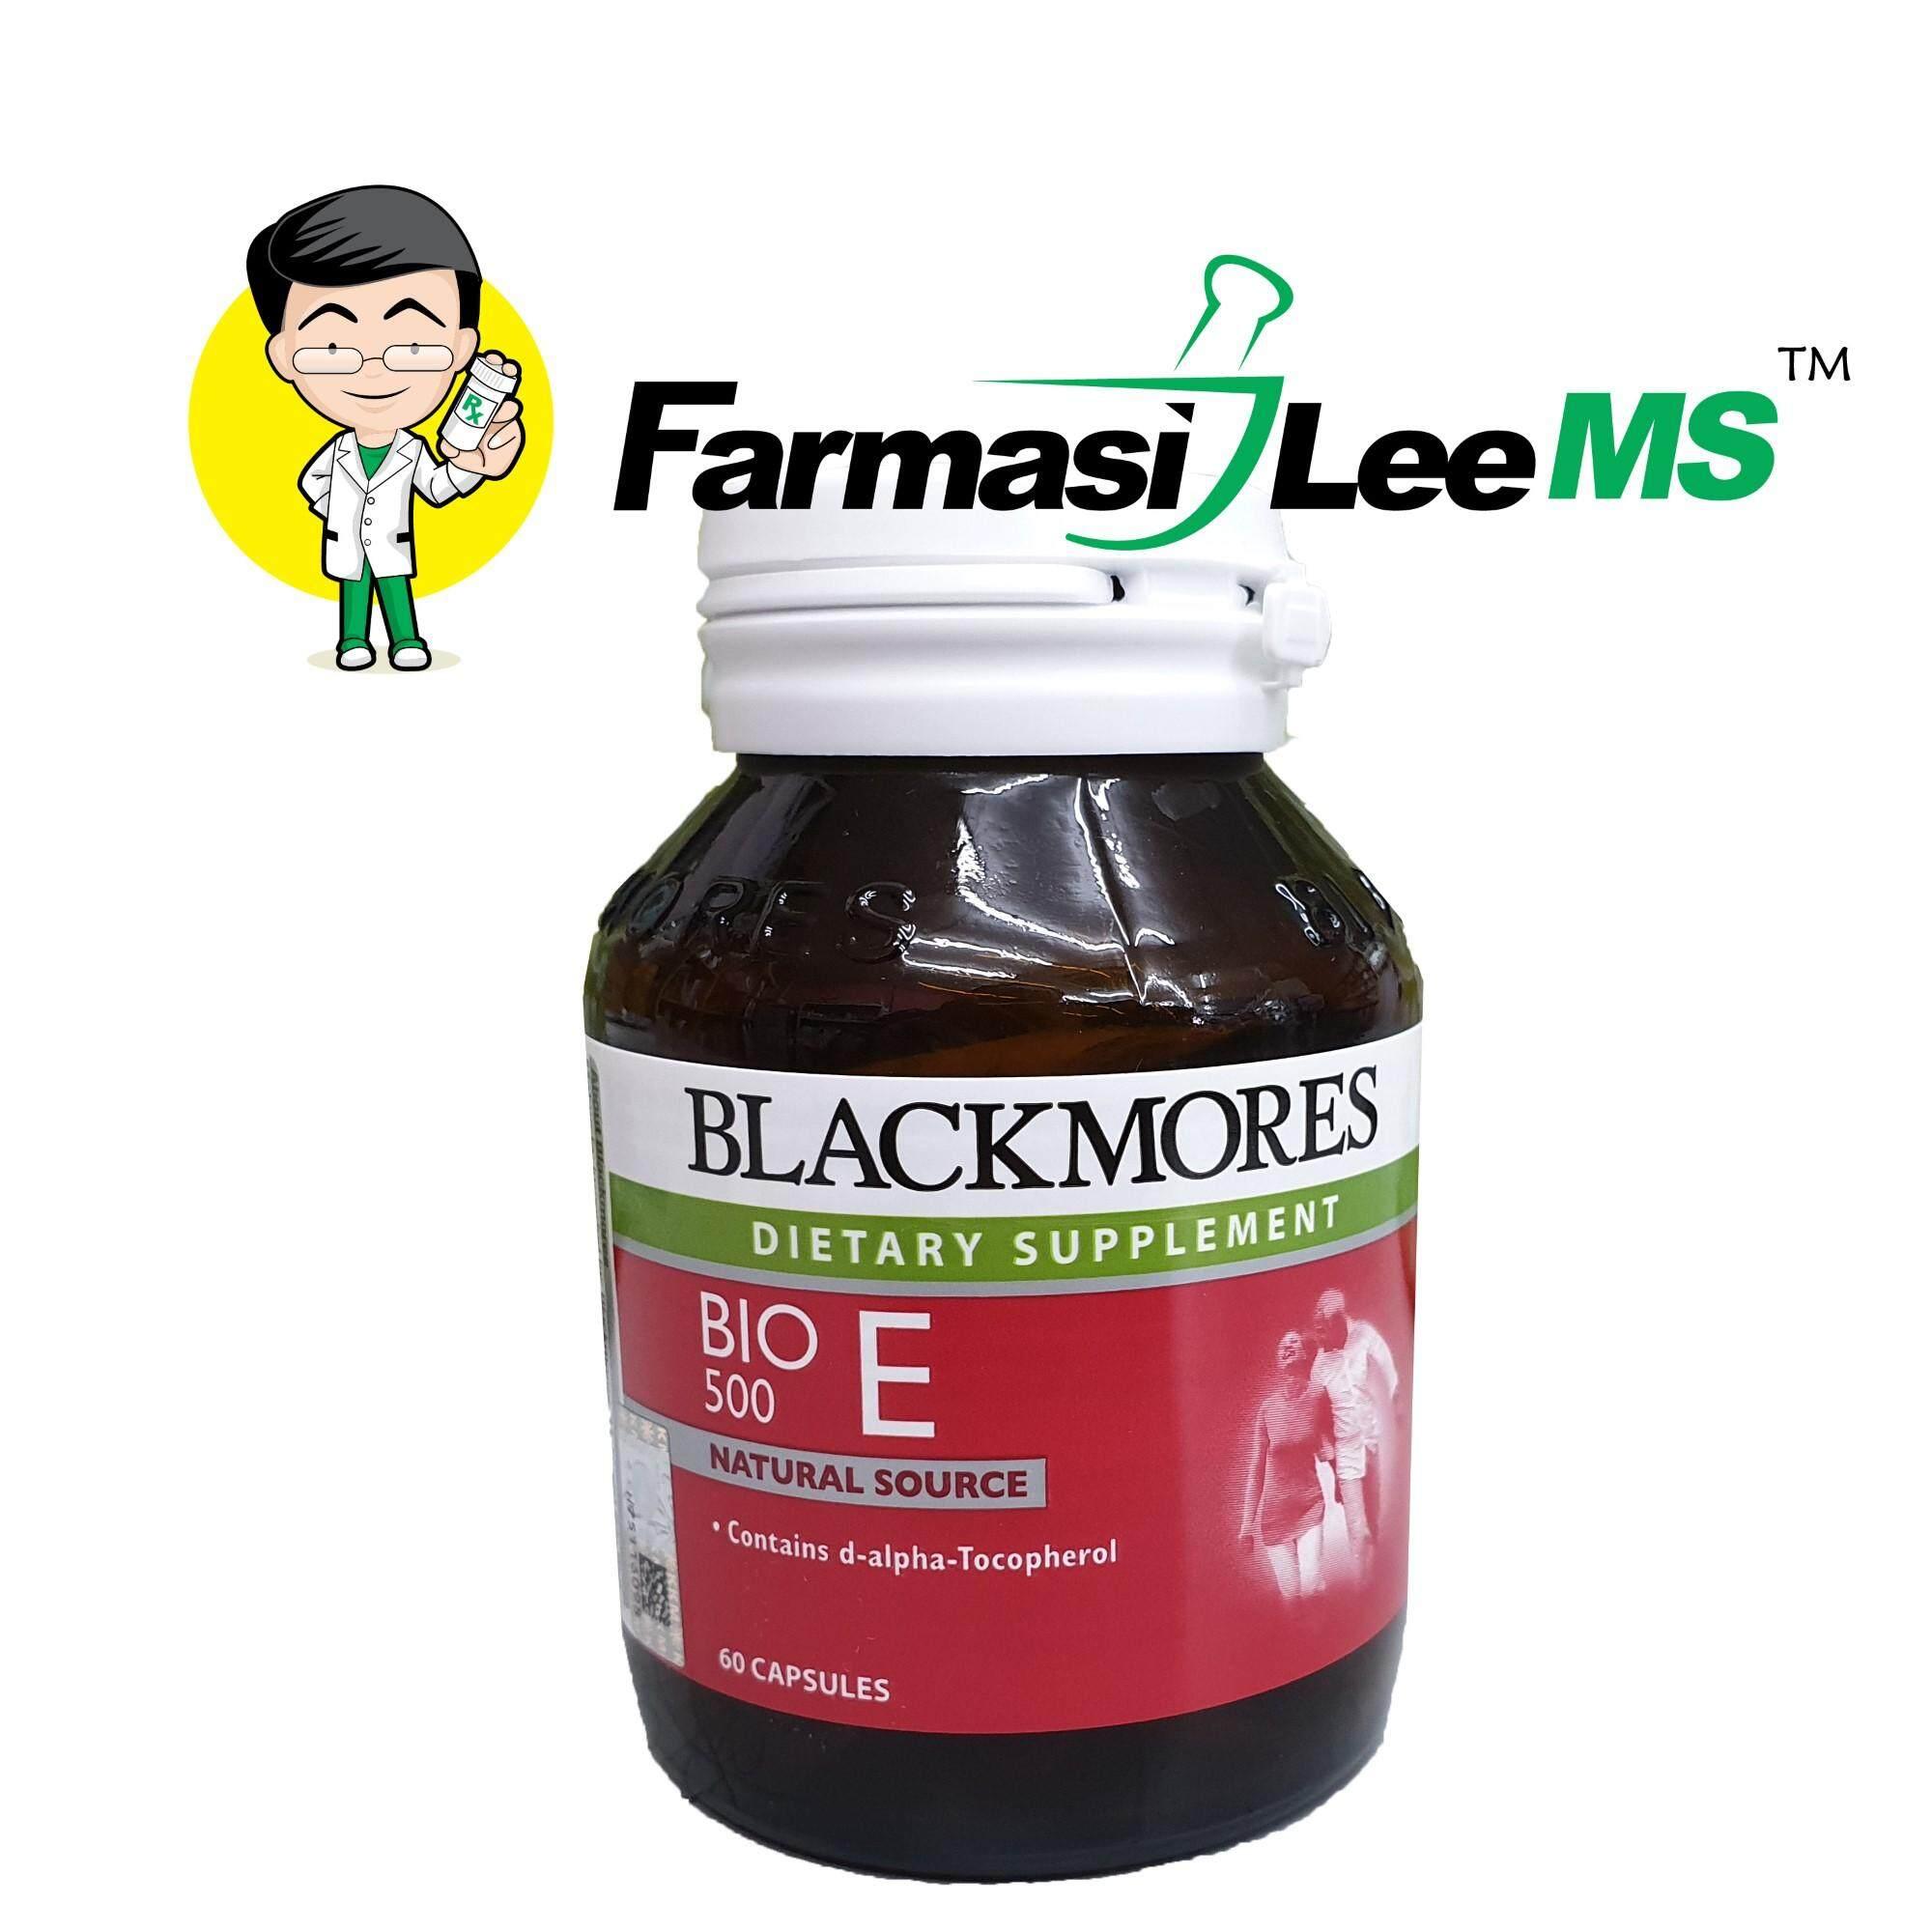 Detoxification Buy At Best Price In Malaysia Www Blackmores Natural E 250iu 50 Capsules Bio 500iu 60 Exp 10 2020